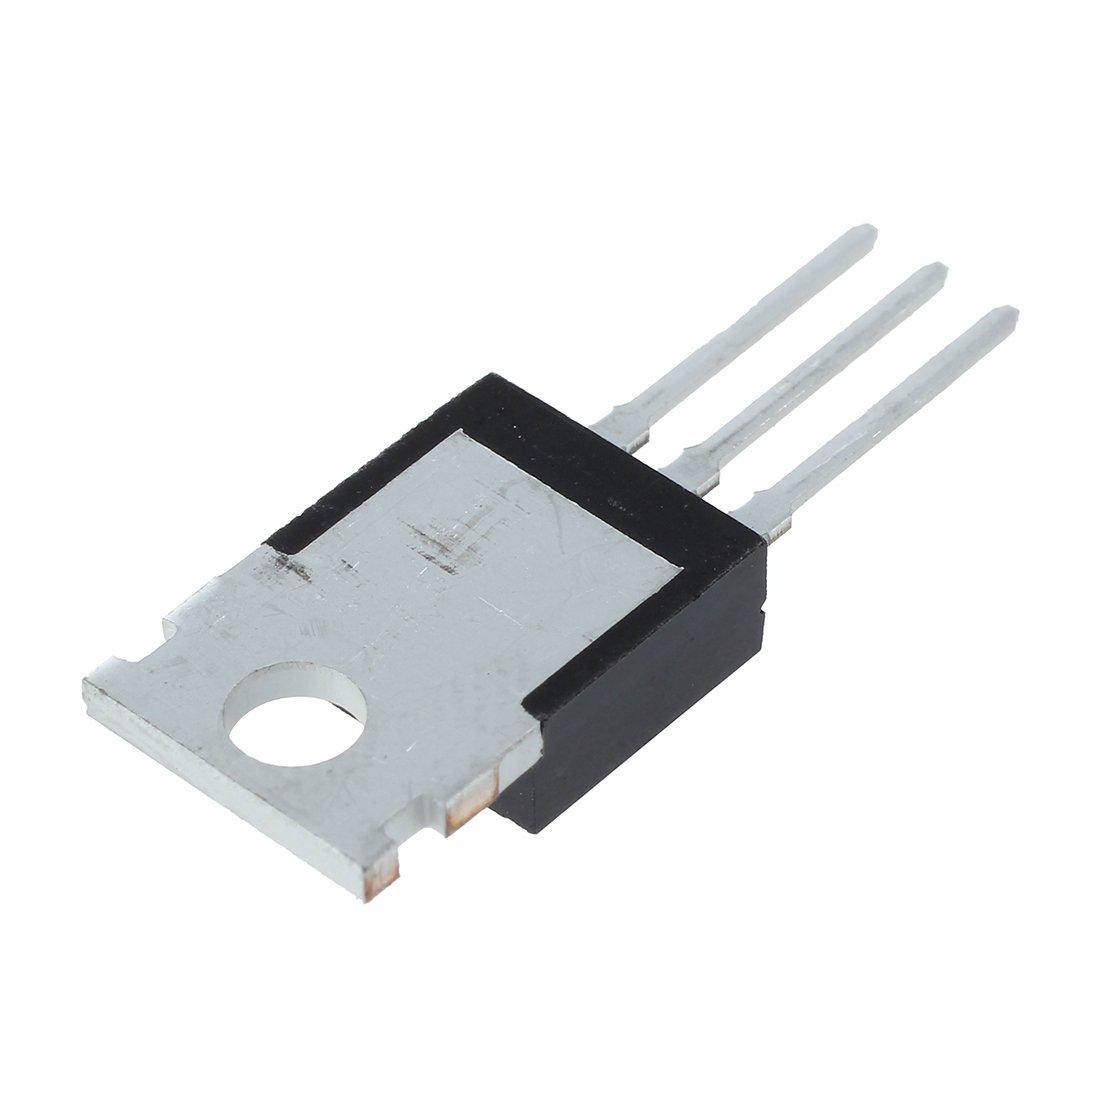 SODIAL(R) 10pcs IRFZ44N IRFZ44 Power Transistor MOSFET N-Channel 49A amp 55V 015285A2